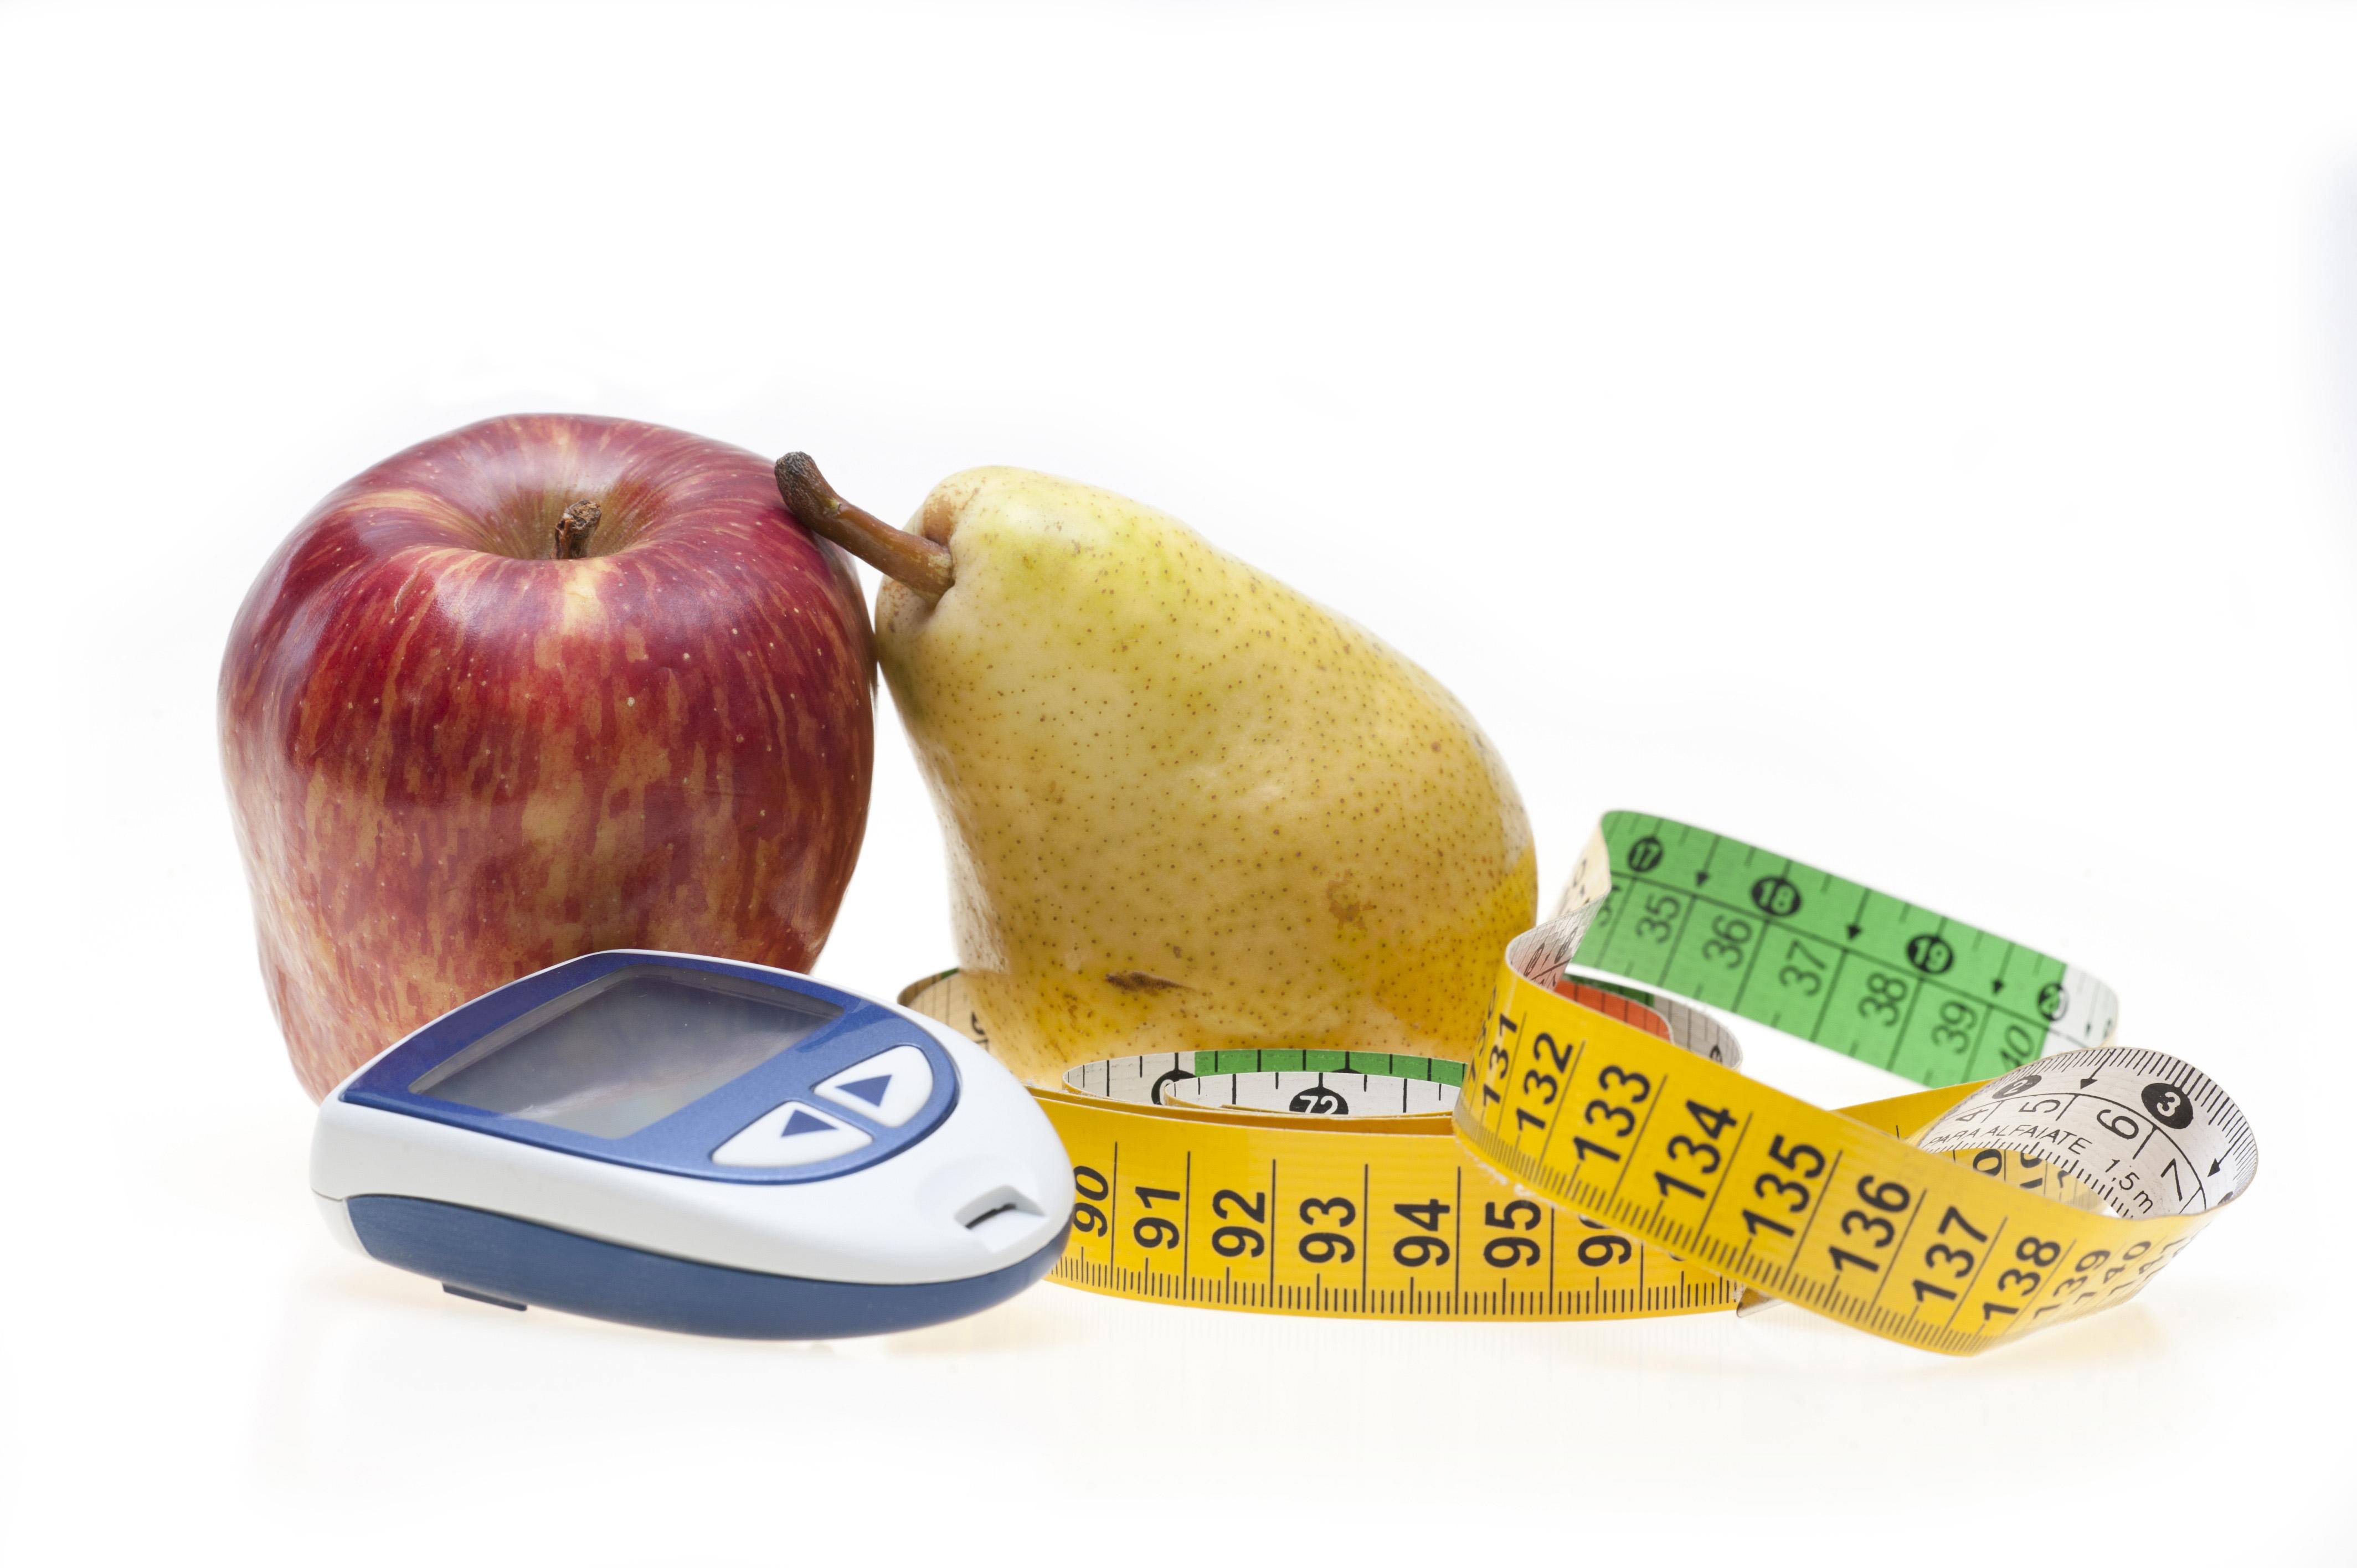 DiabetesFruitMeter.jpg